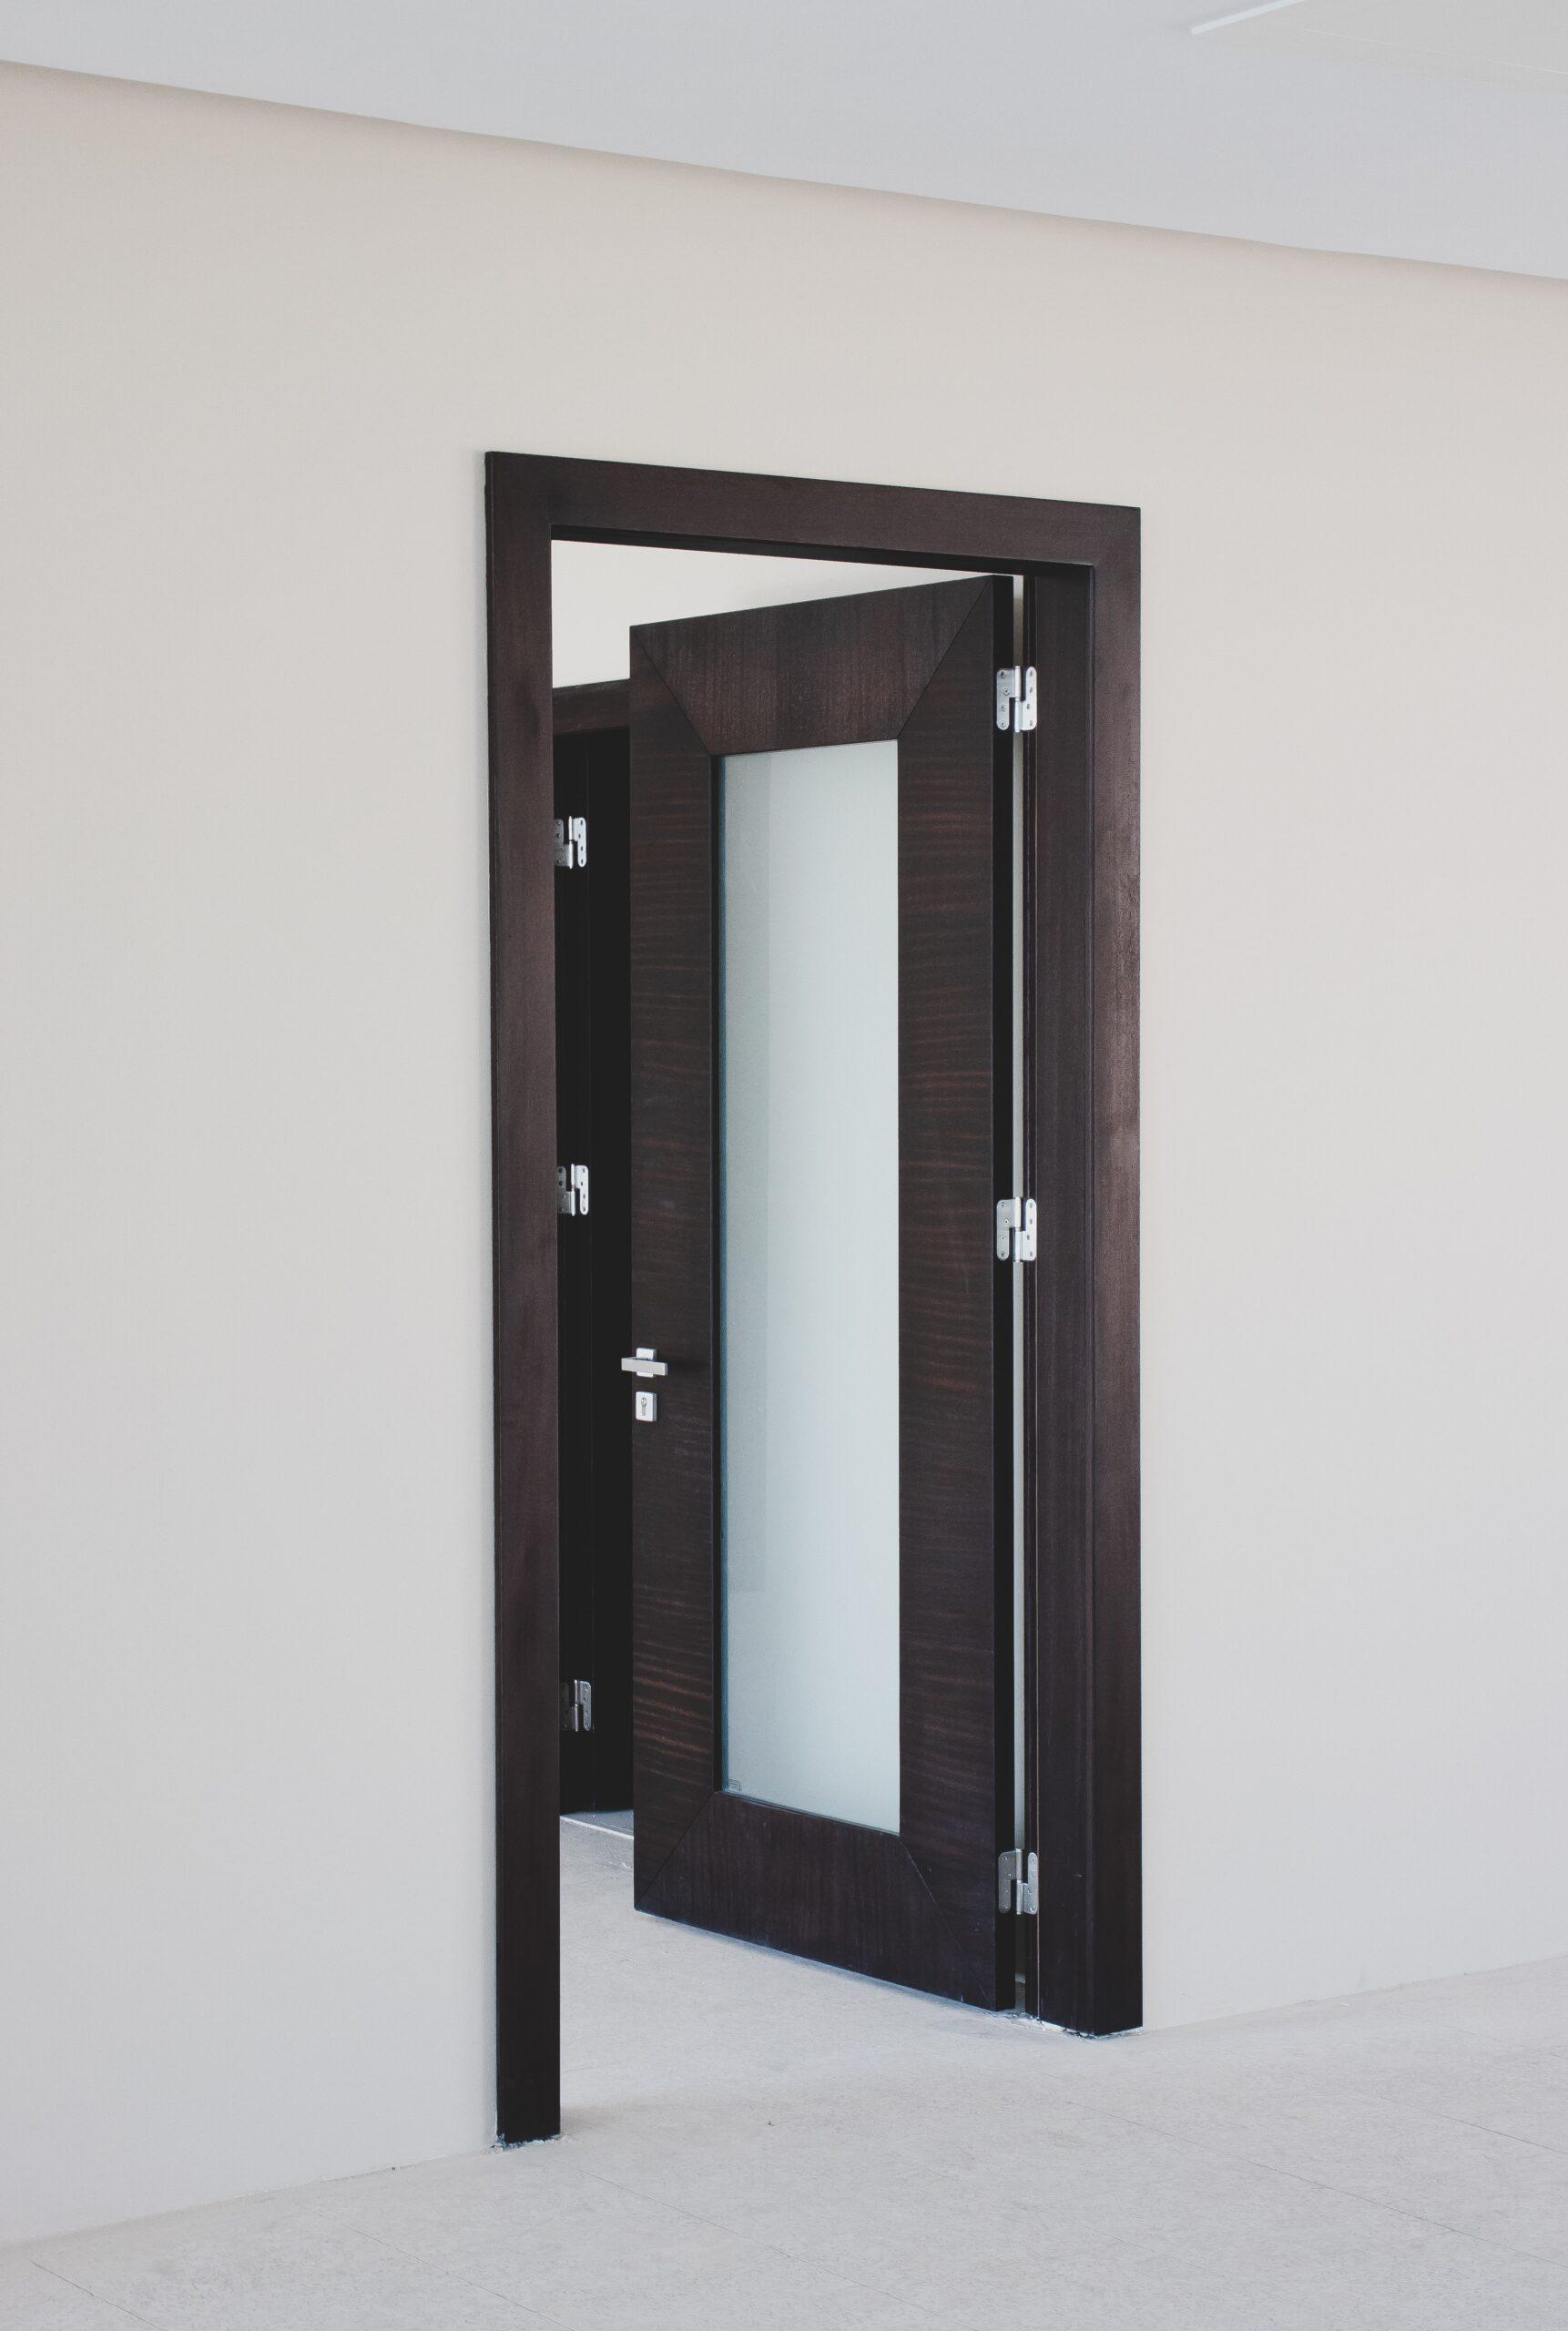 báo giá cửa gỗ mdf melamine